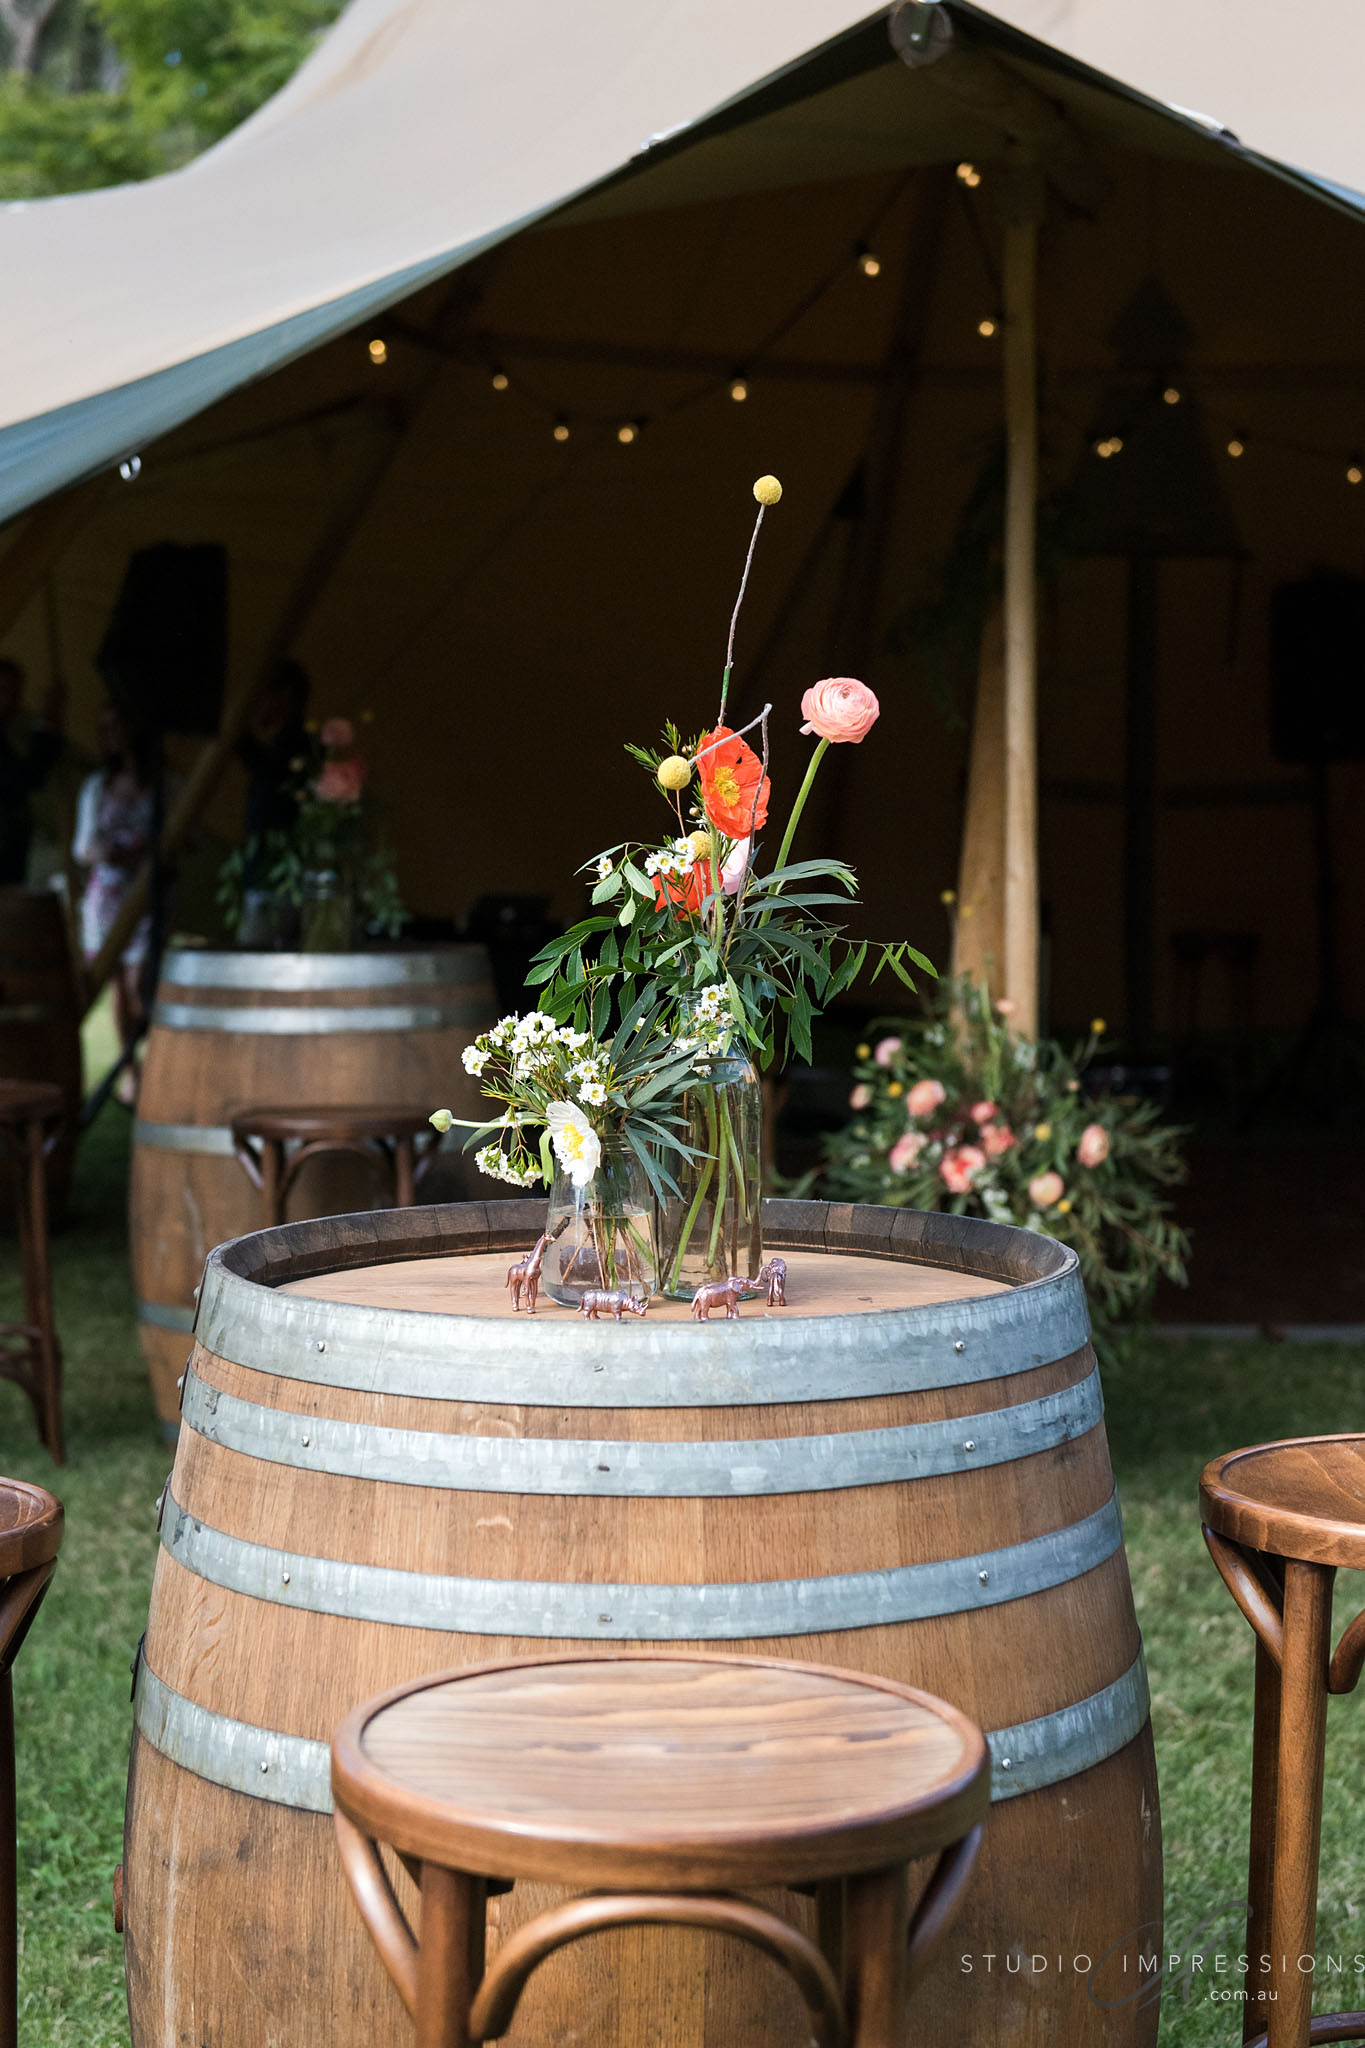 Gold Coast wedding, tipi wedding, gold coast, large marquee, event hire, tipi hire, wedding reception